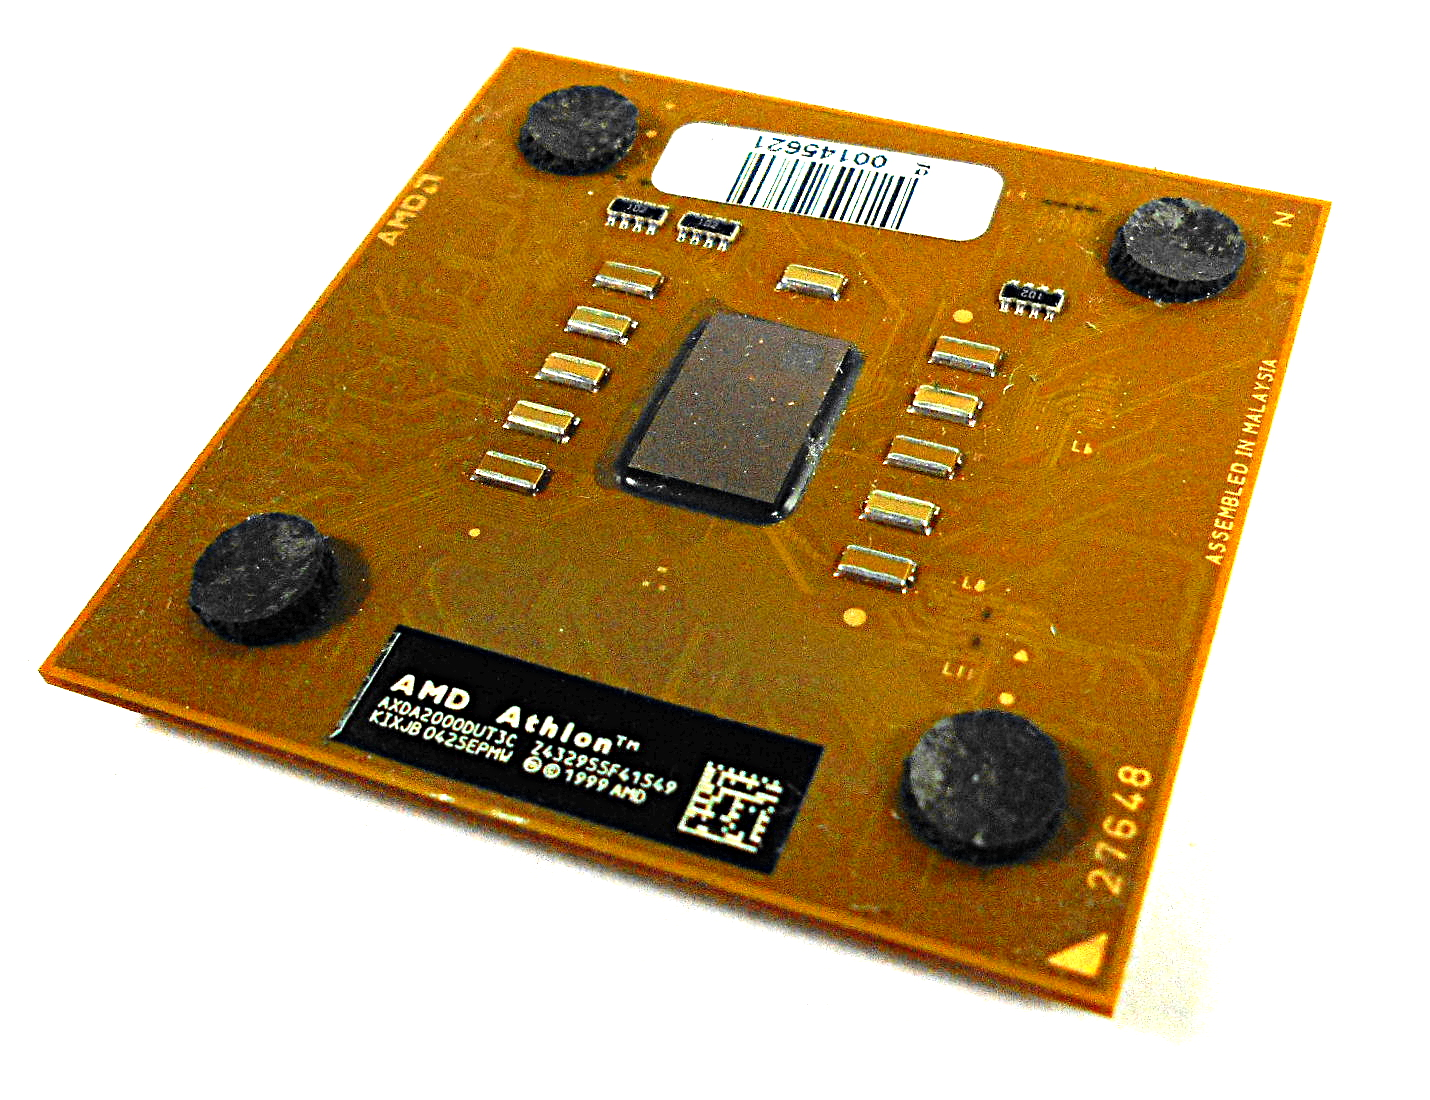 AMD AXDA2000DUT3 Athlon XP 2000+ Socket A/462 Brown Processor